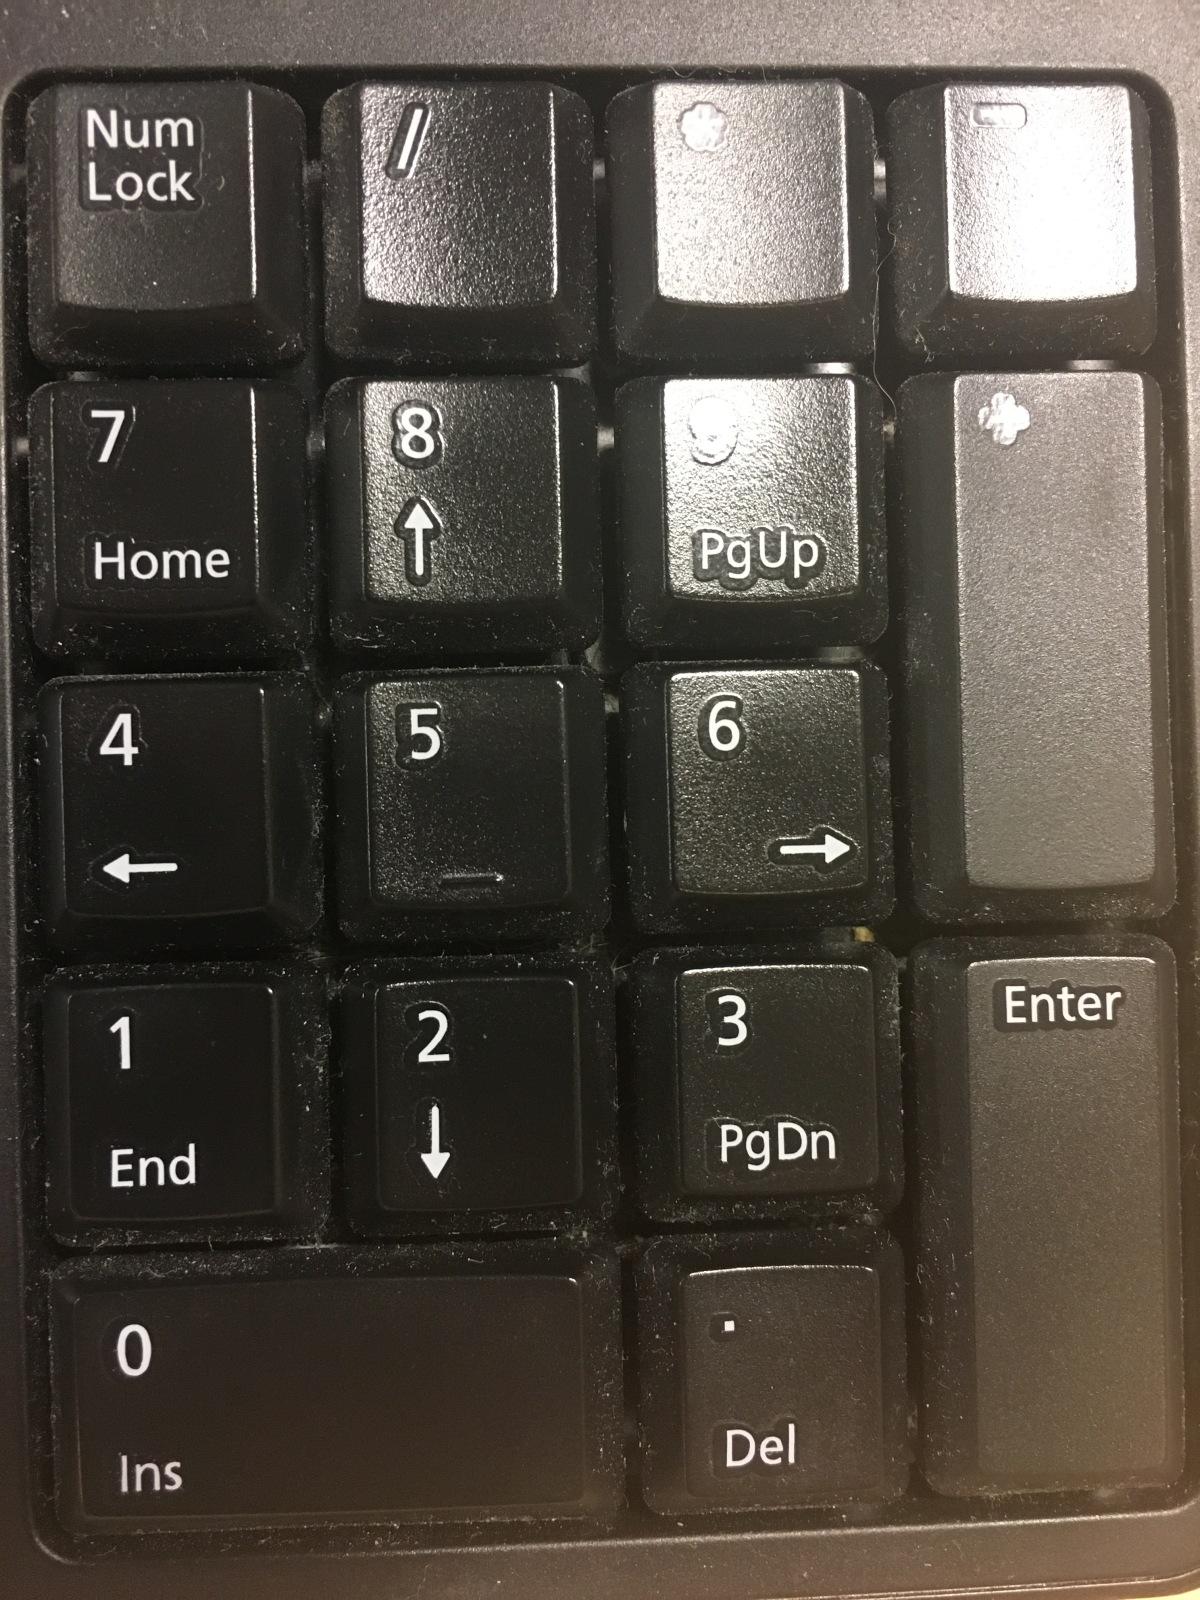 The 10 Key